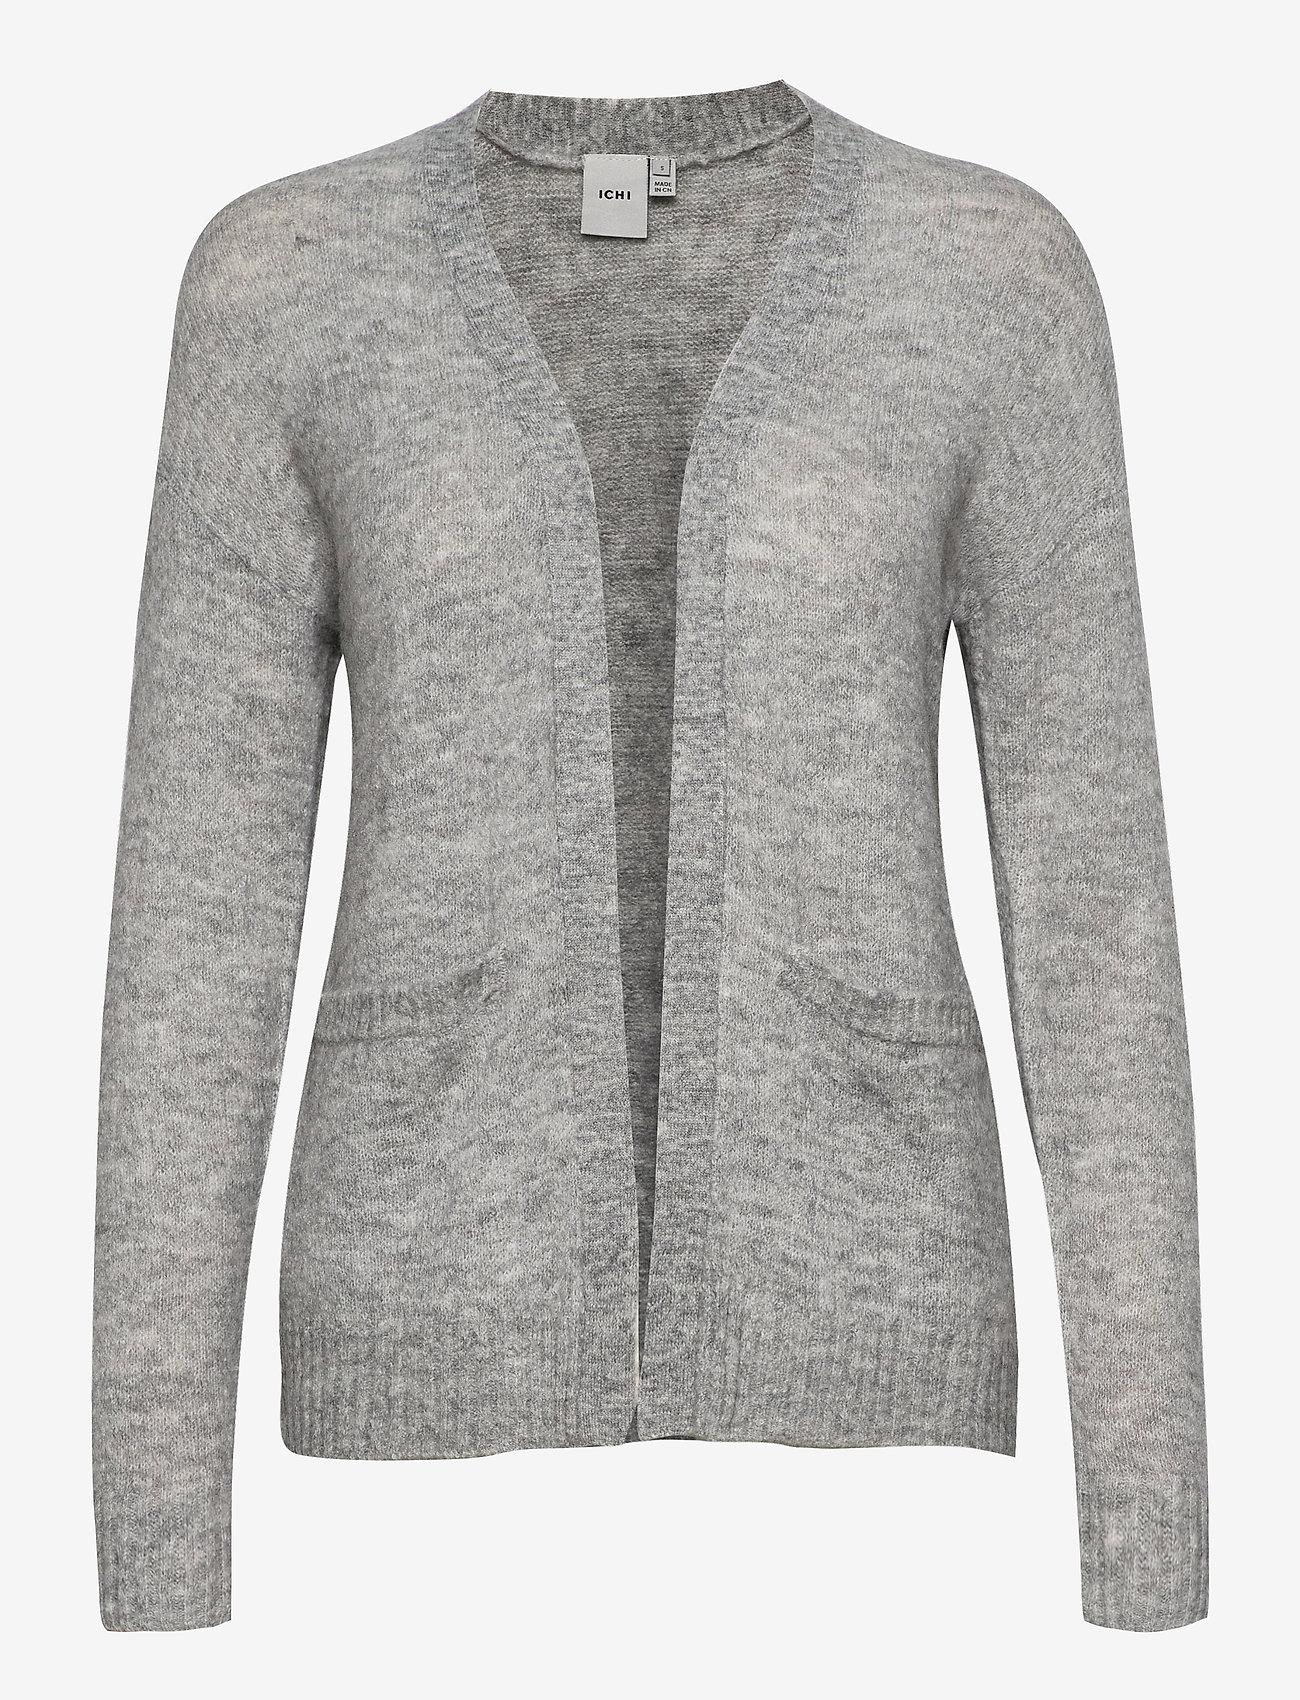 ICHI - AMARA CA2 - cardigans - grey melange - 0